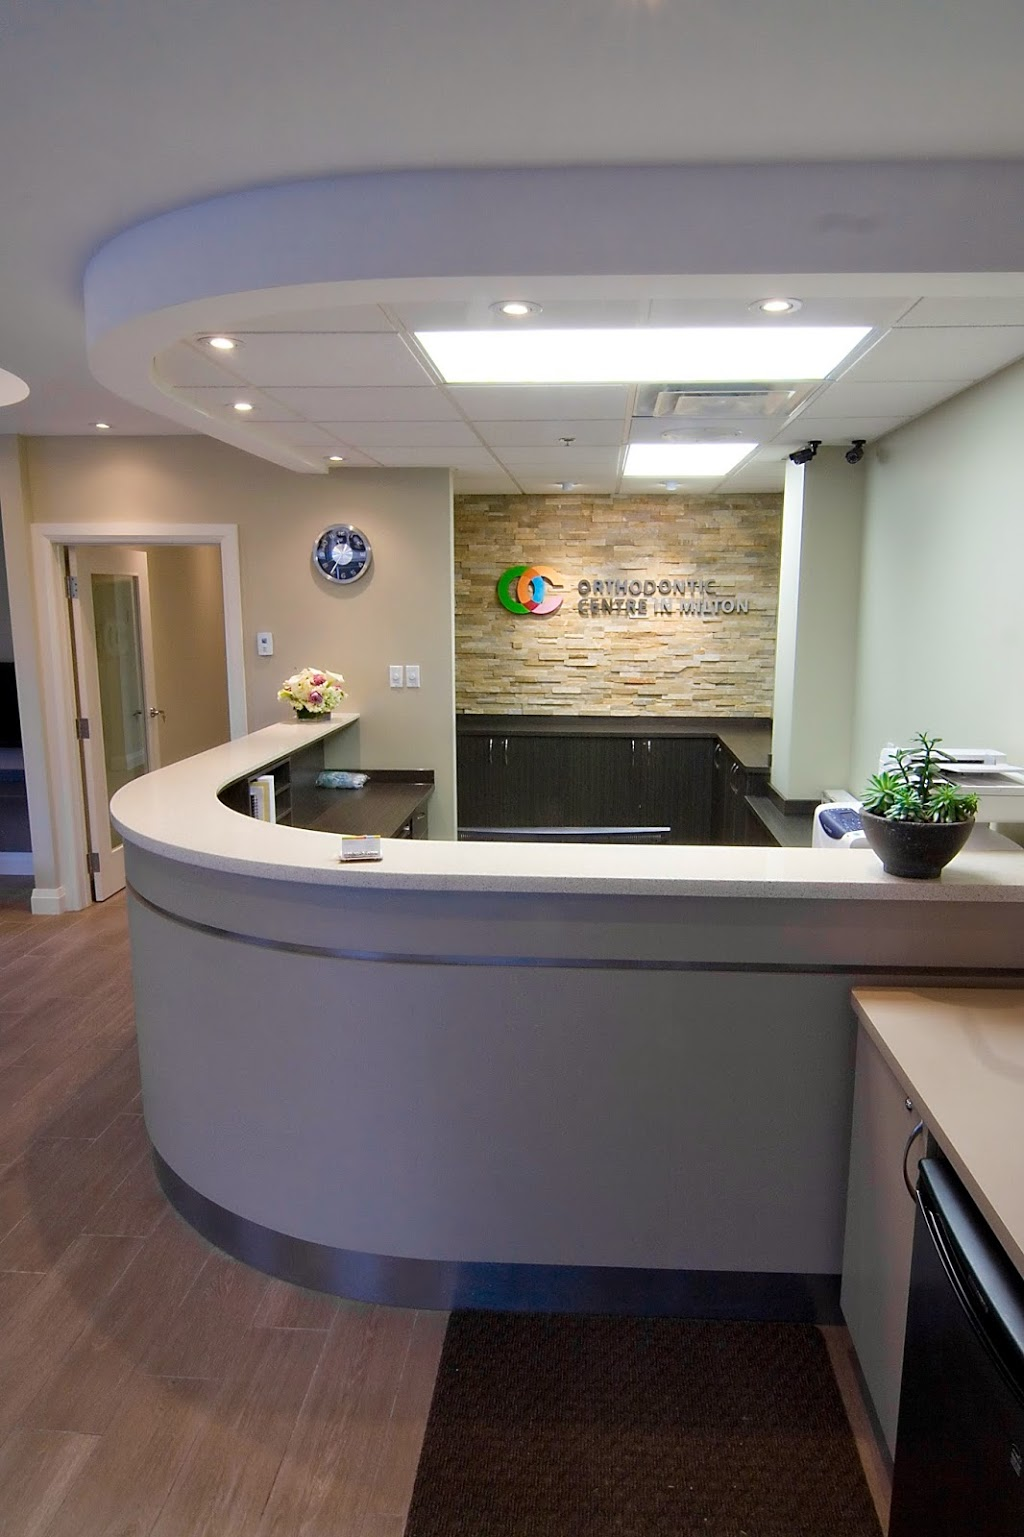 Orthodontic Centre In Milton | dentist | 336 Bronte St S, Milton, ON L9T 7W6, Canada | 9056369888 OR +1 905-636-9888